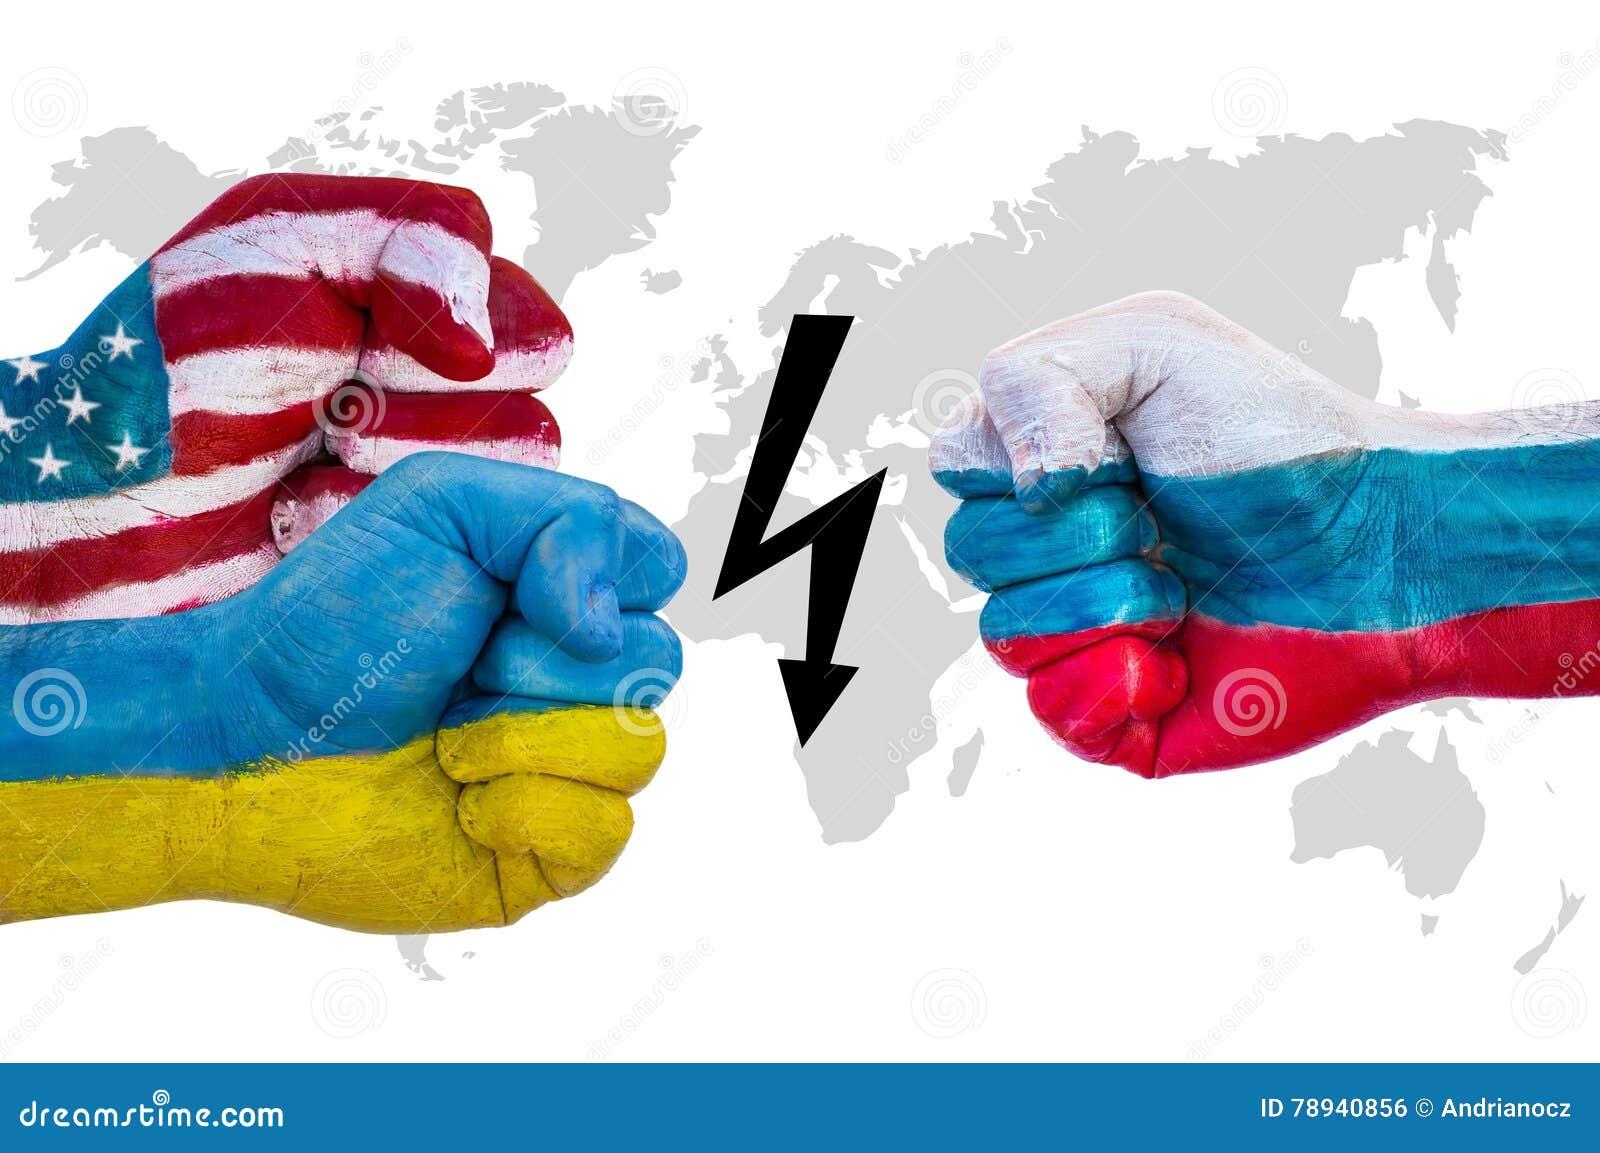 USA och Ukraina kontra Ryssland